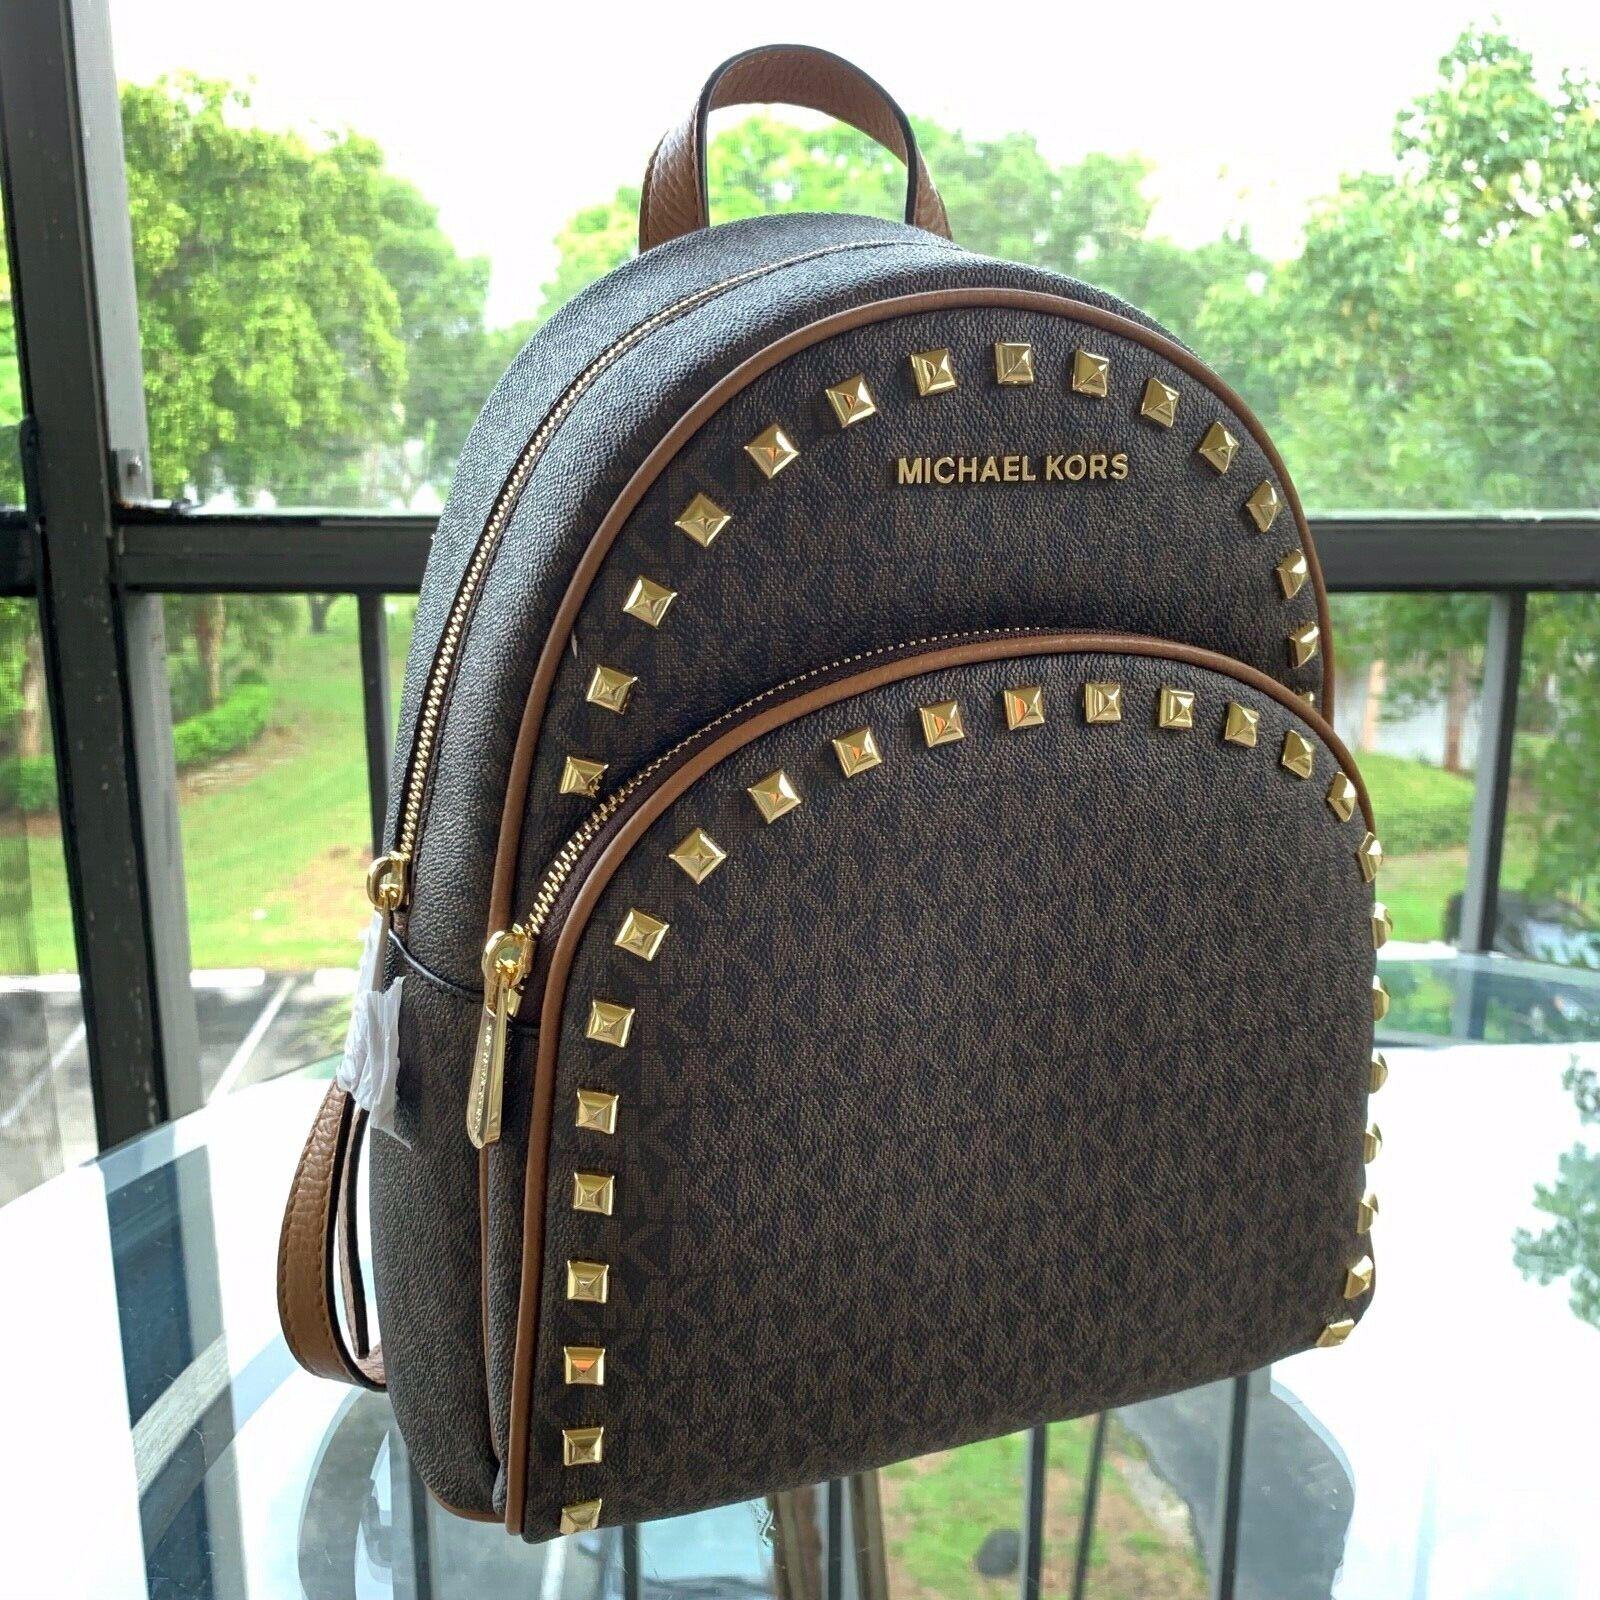 Michael Kors Abbey Women Medium Leather Studded Backpack Sch